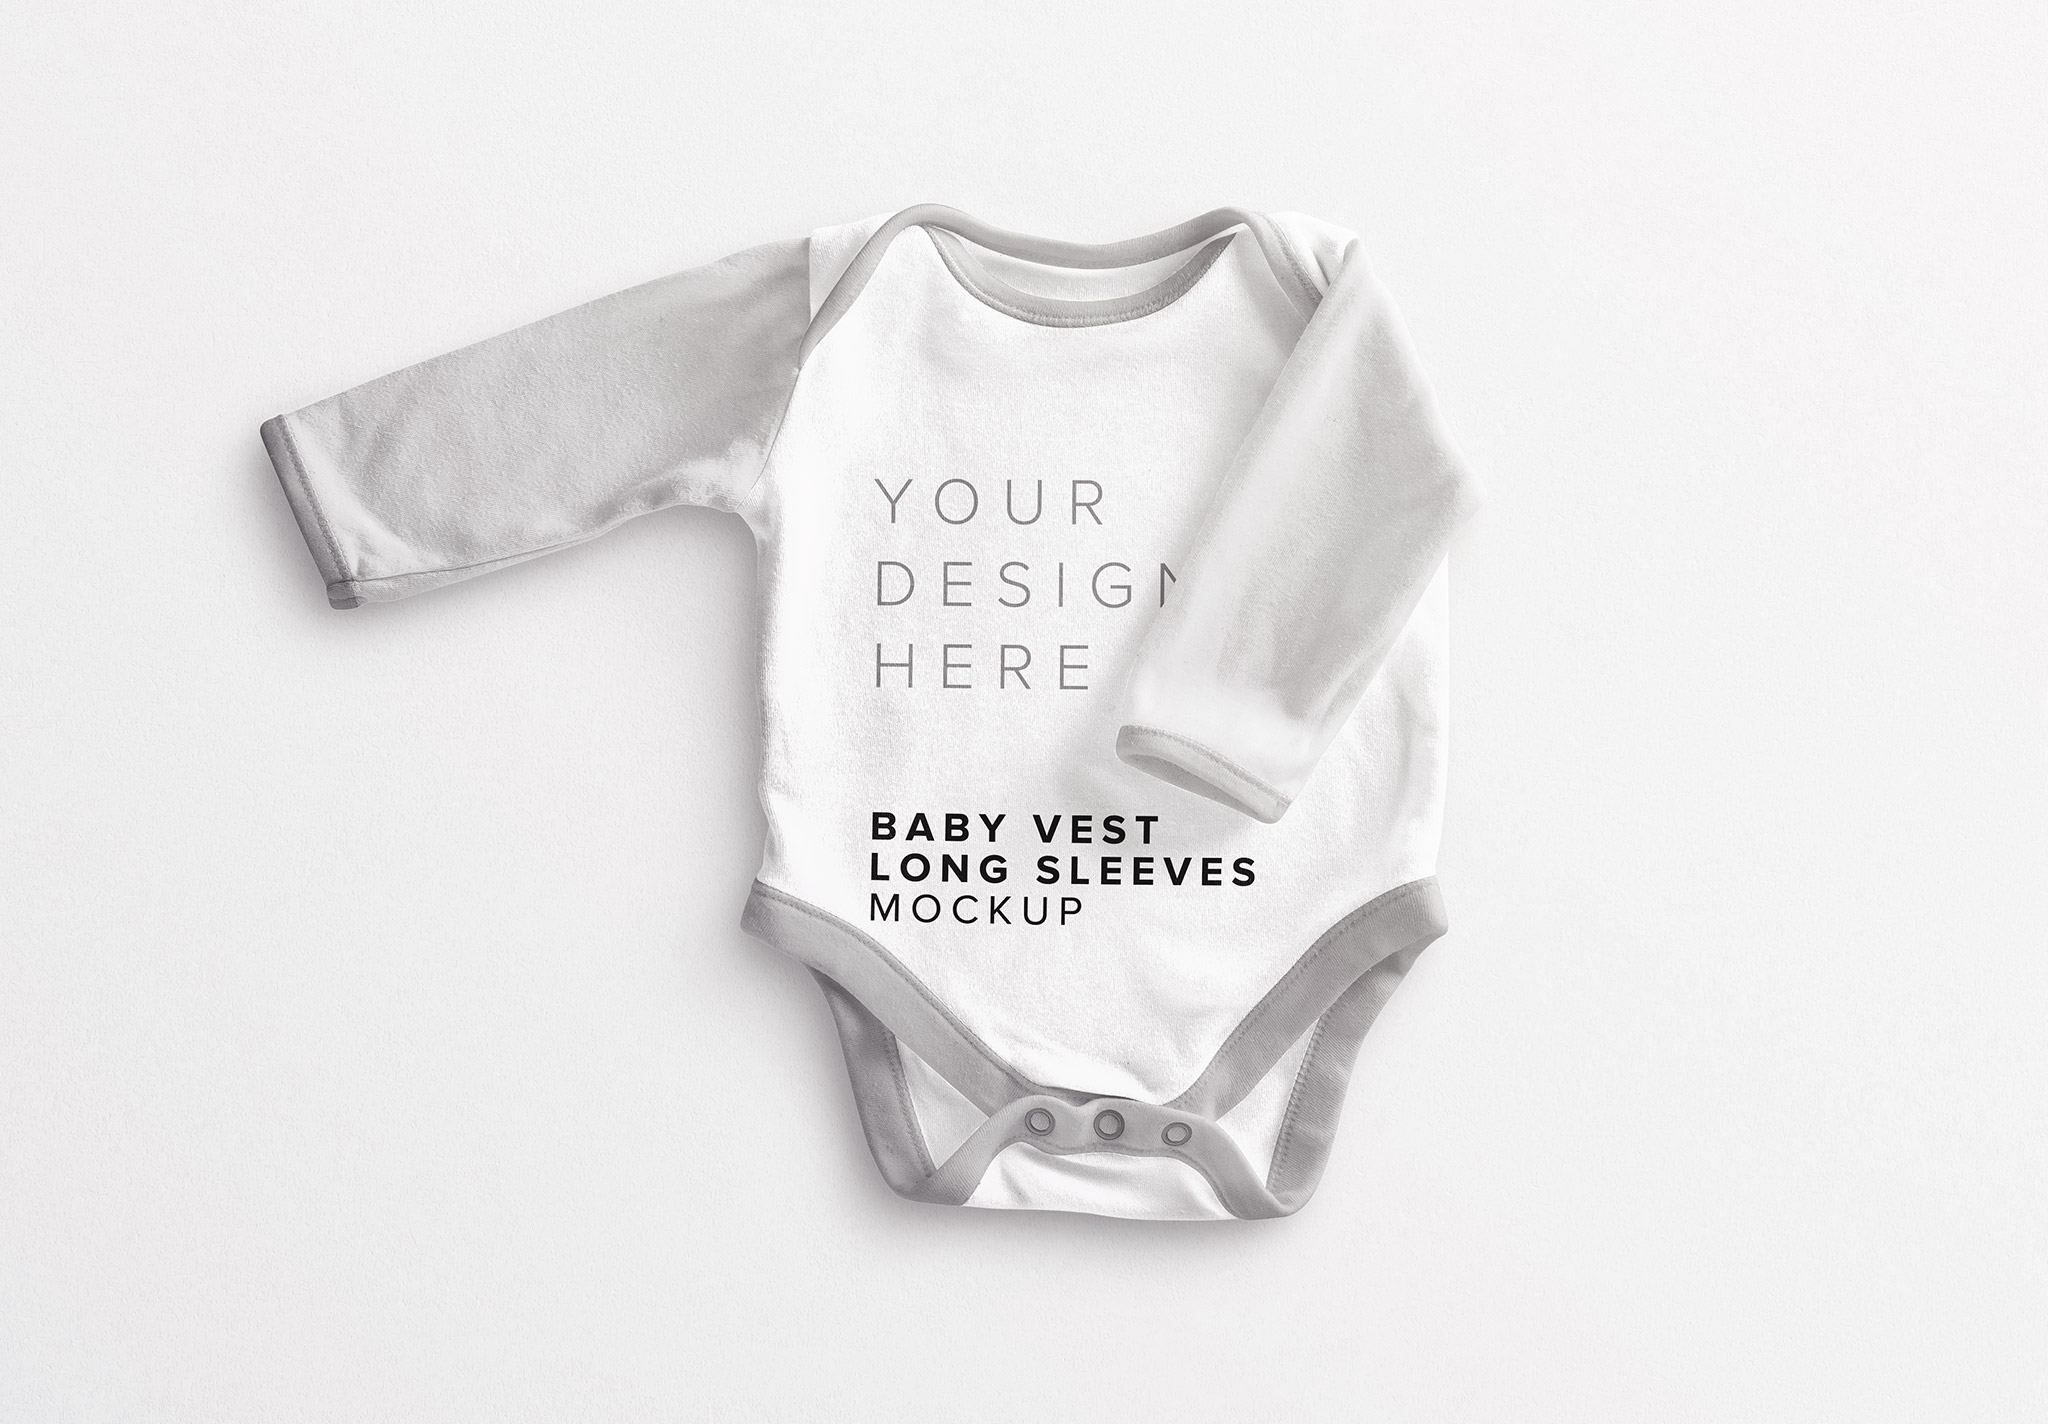 Baby Vest Long Sleeves 2 Mockup thumbnail